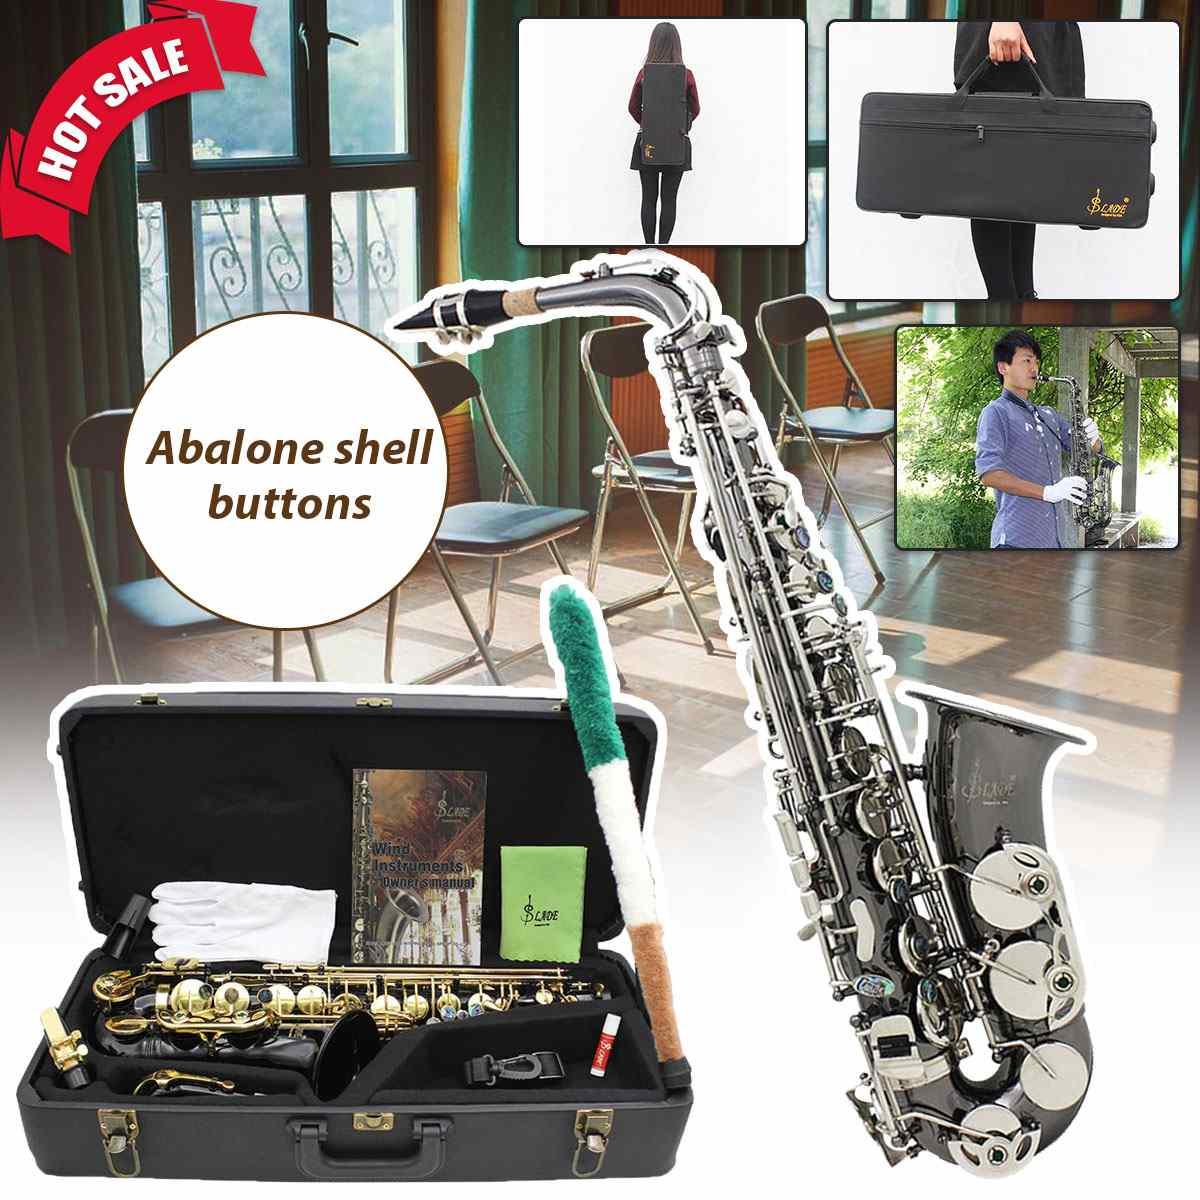 Black Nickel Body Silver Keys Alto Saxophone Sax Musical Instruments black nickel body silver keys alto saxophone sax musical instruments